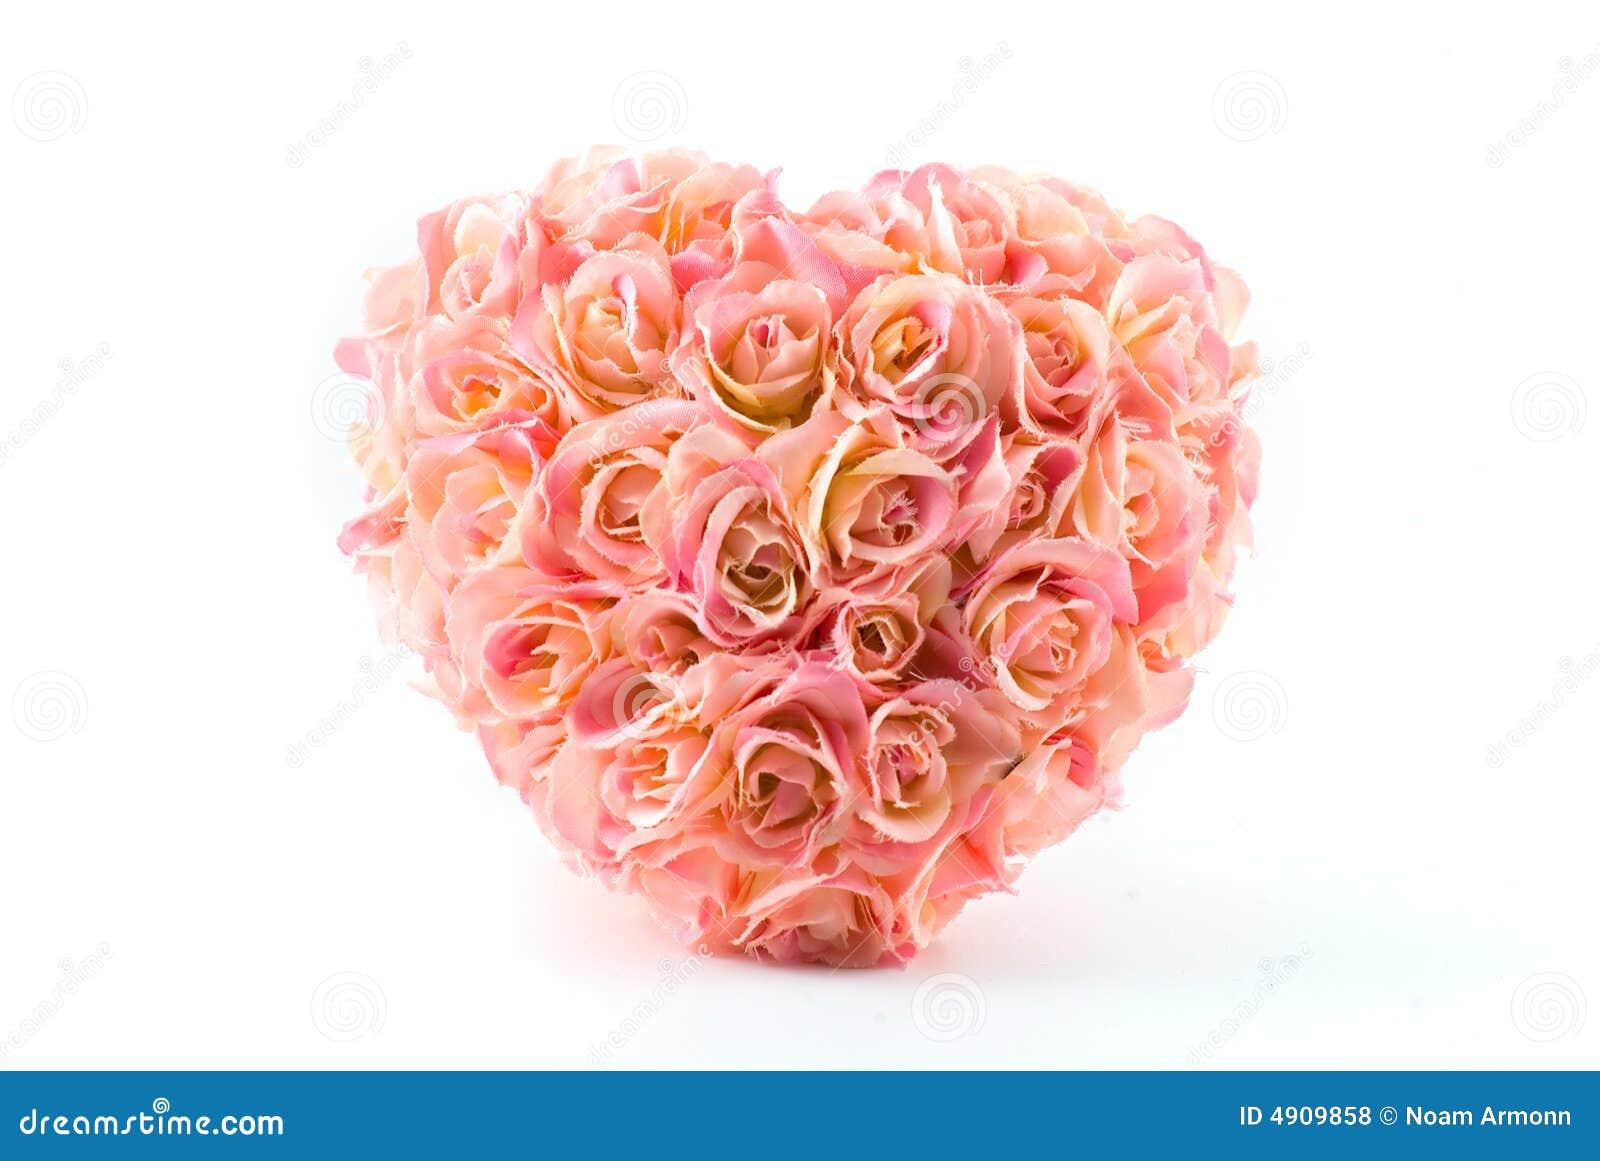 coeur artificiel rose de roses photo stock image du heureux isolement 4909858. Black Bedroom Furniture Sets. Home Design Ideas